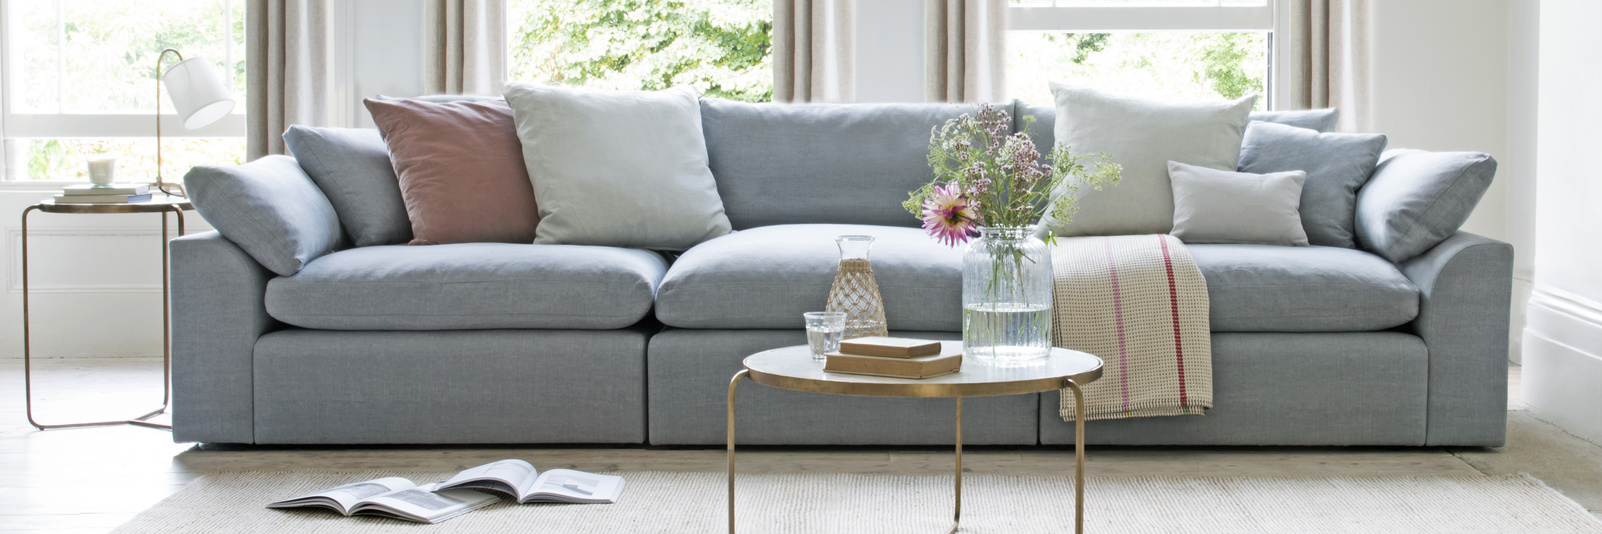 Cuddlemuffin sofa